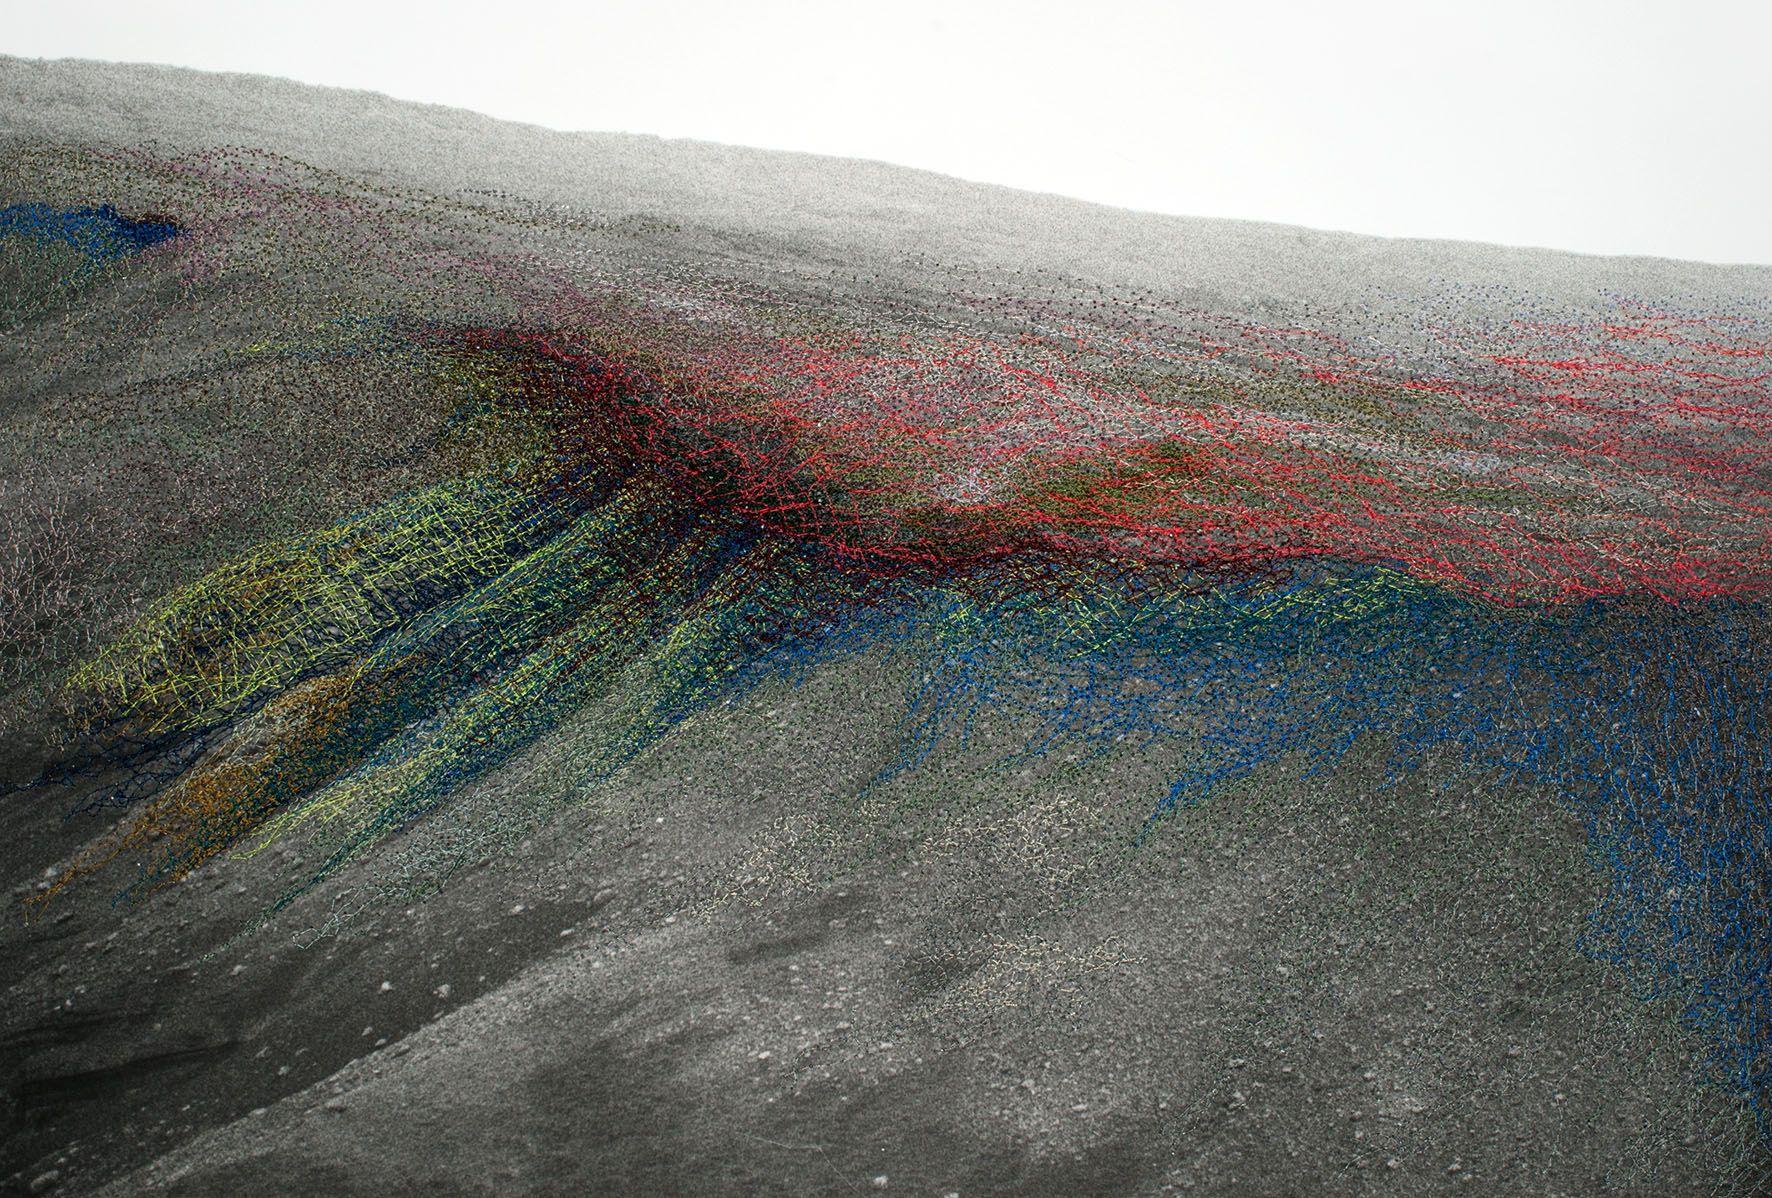 Textural Landscapes